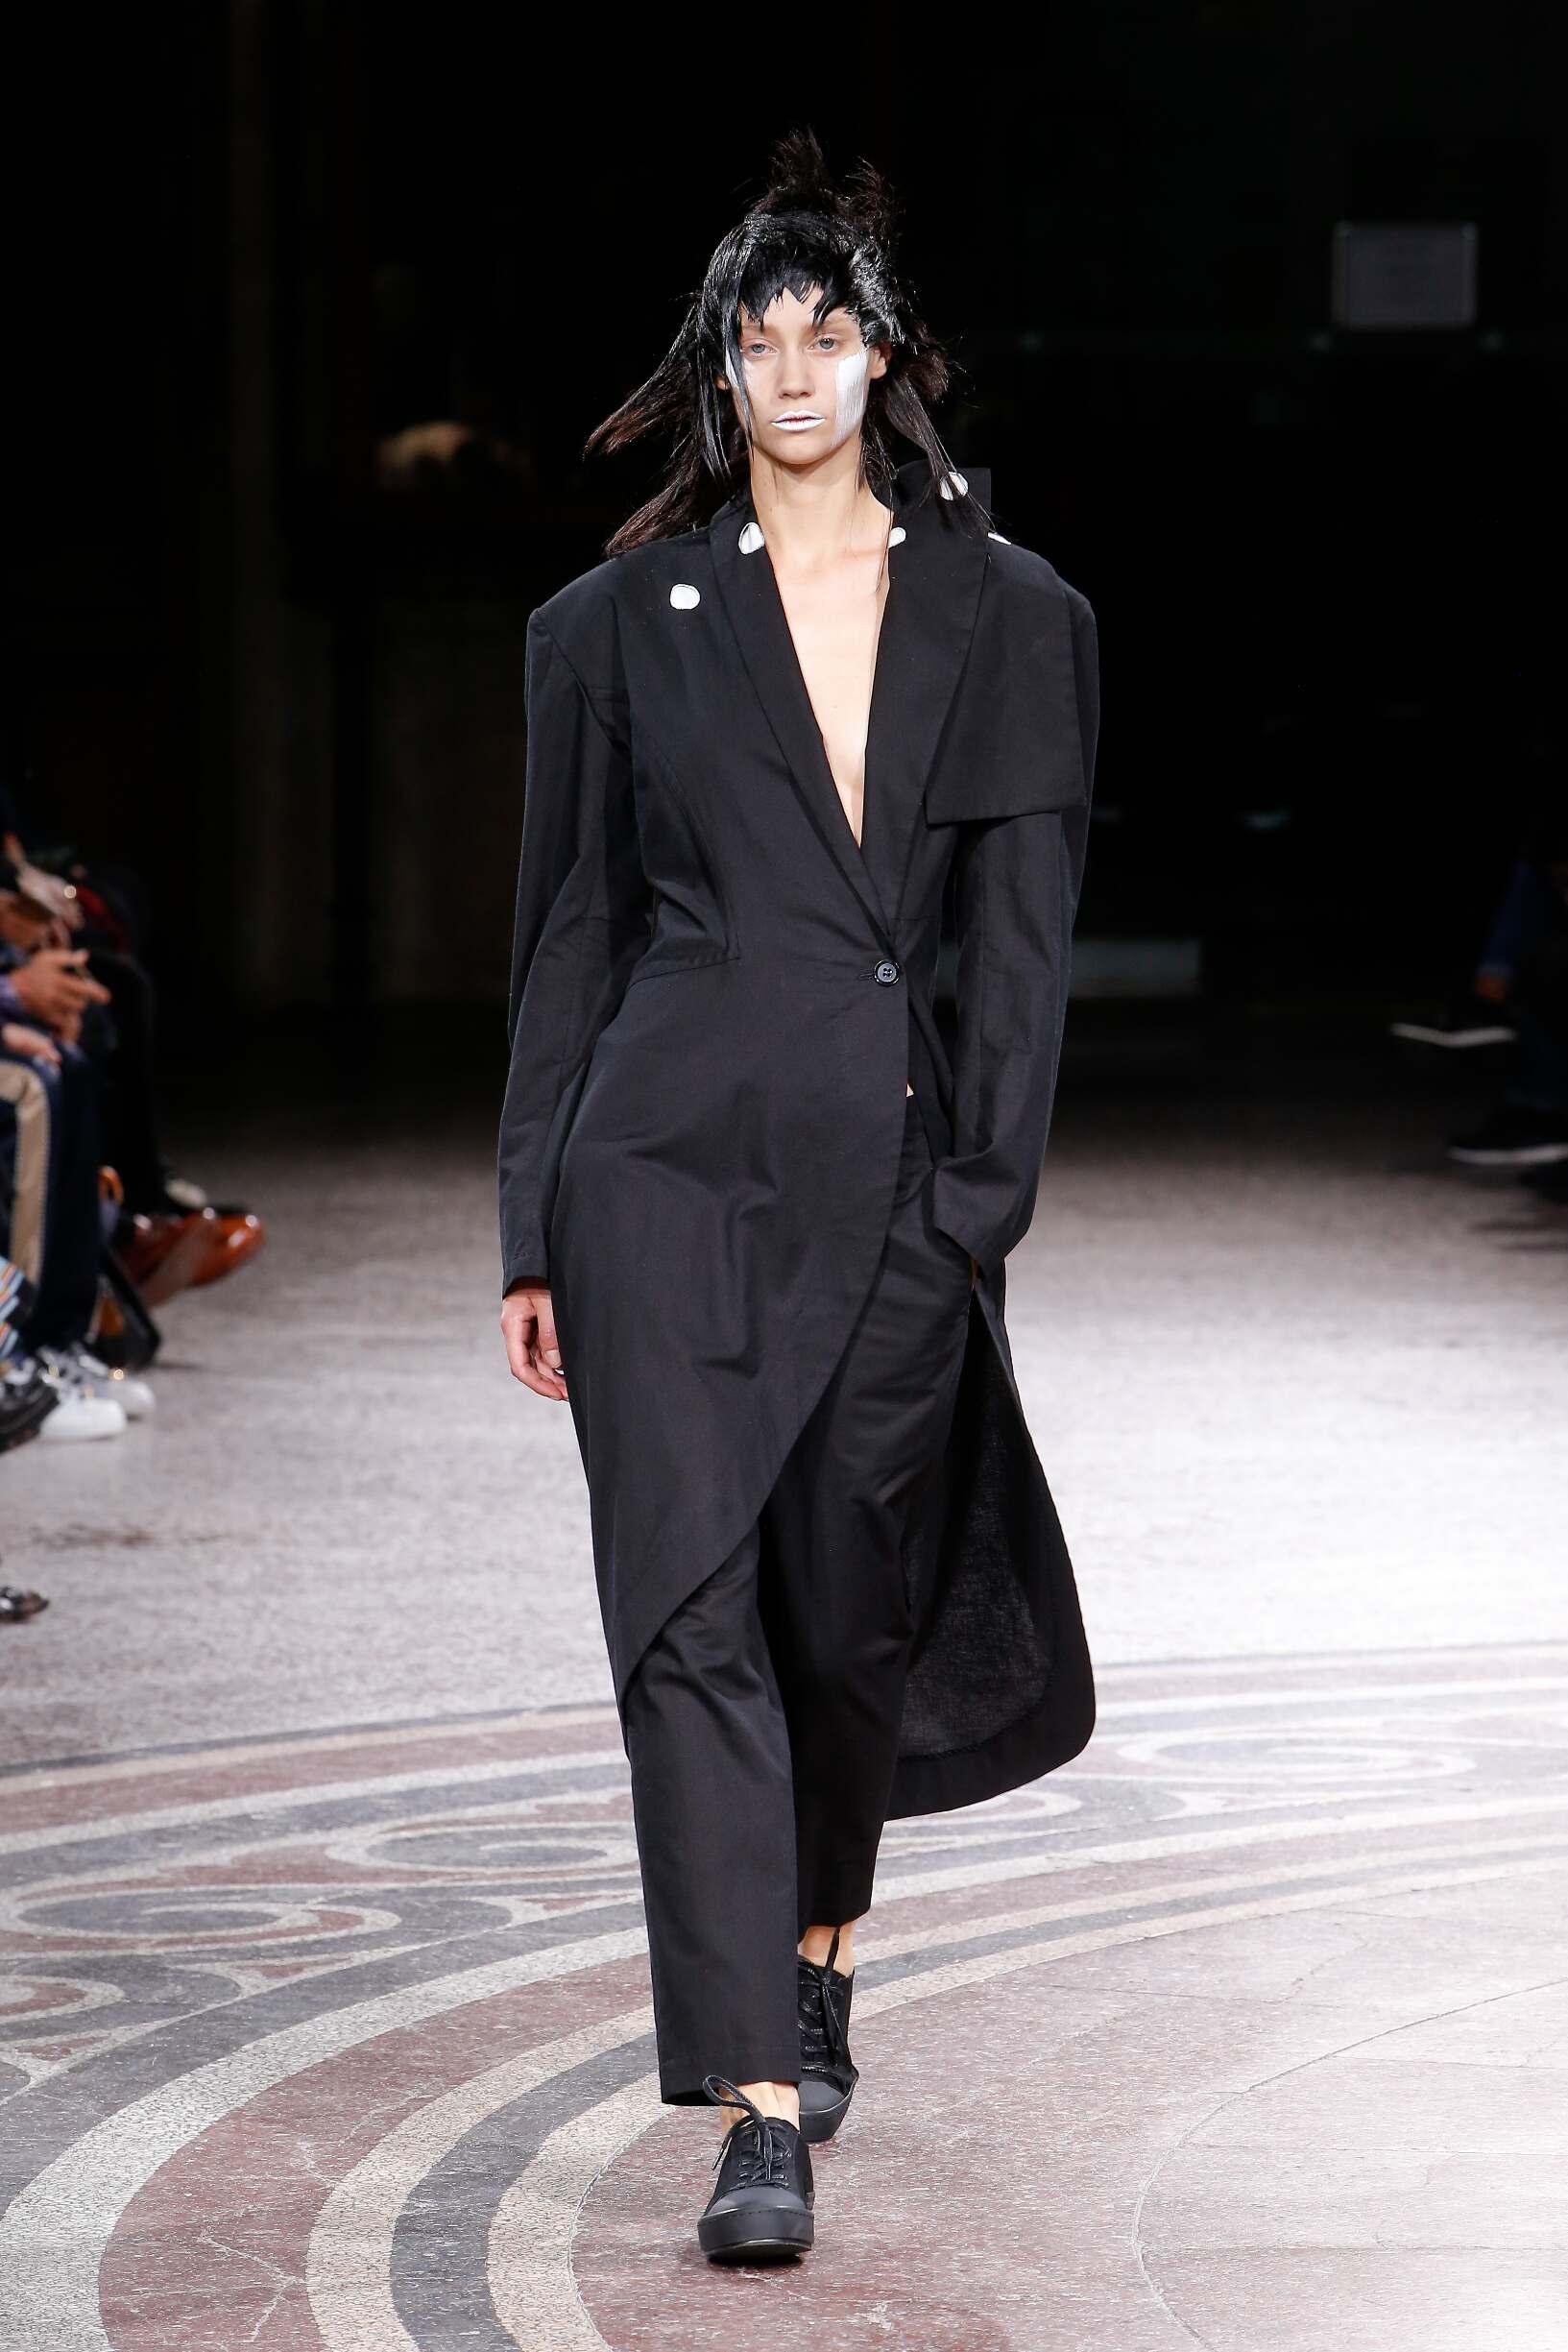 Yohji Yamamoto SS 2017 Womenswear